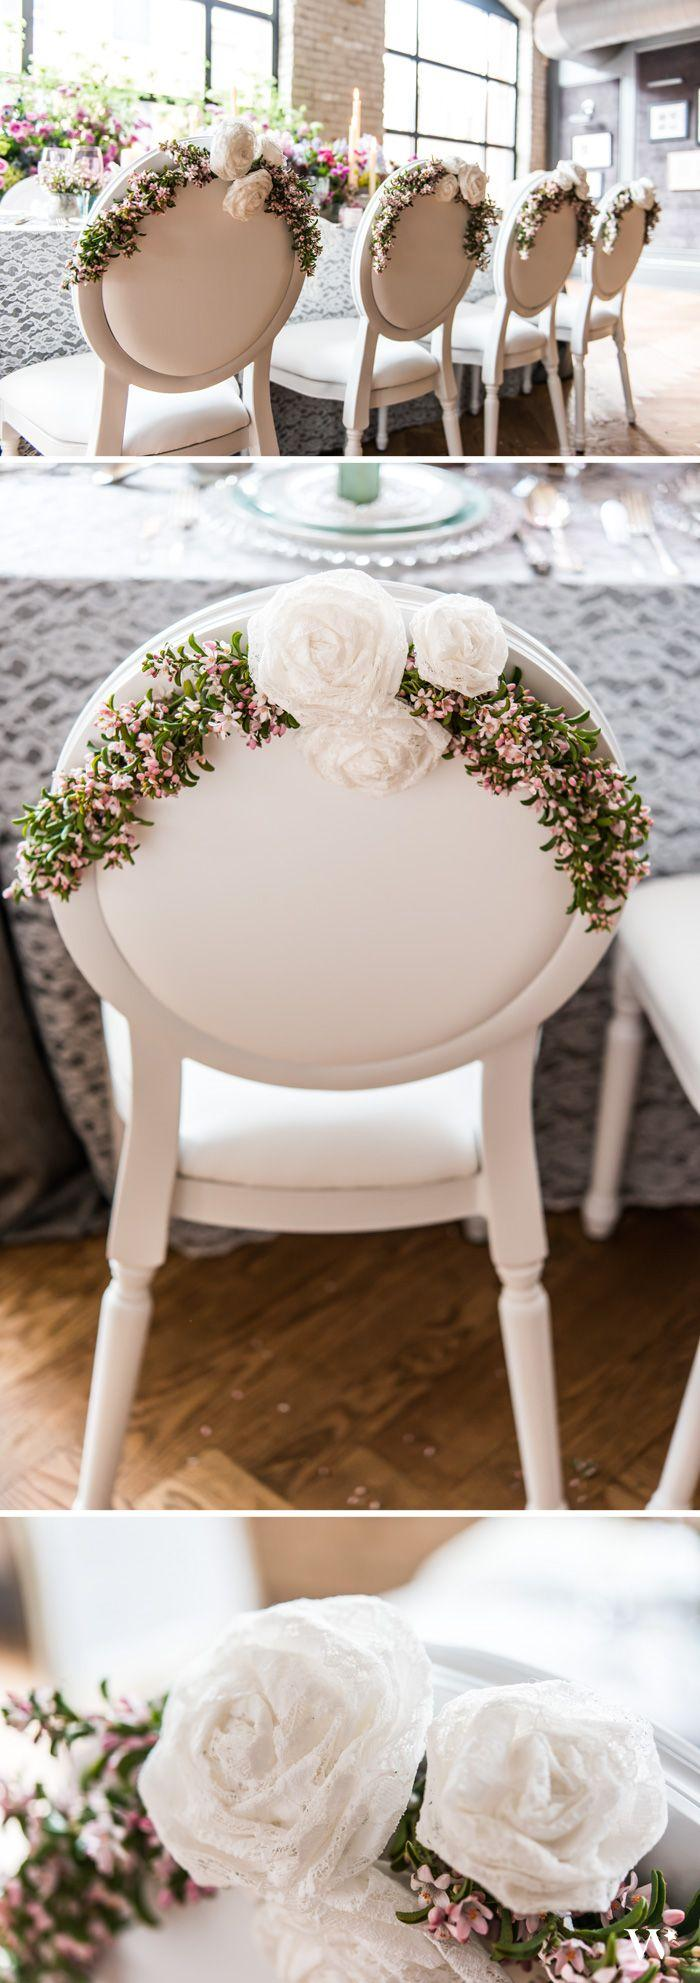 Wedding - Decorative Rolled Fabric Lace Flowers - Medium